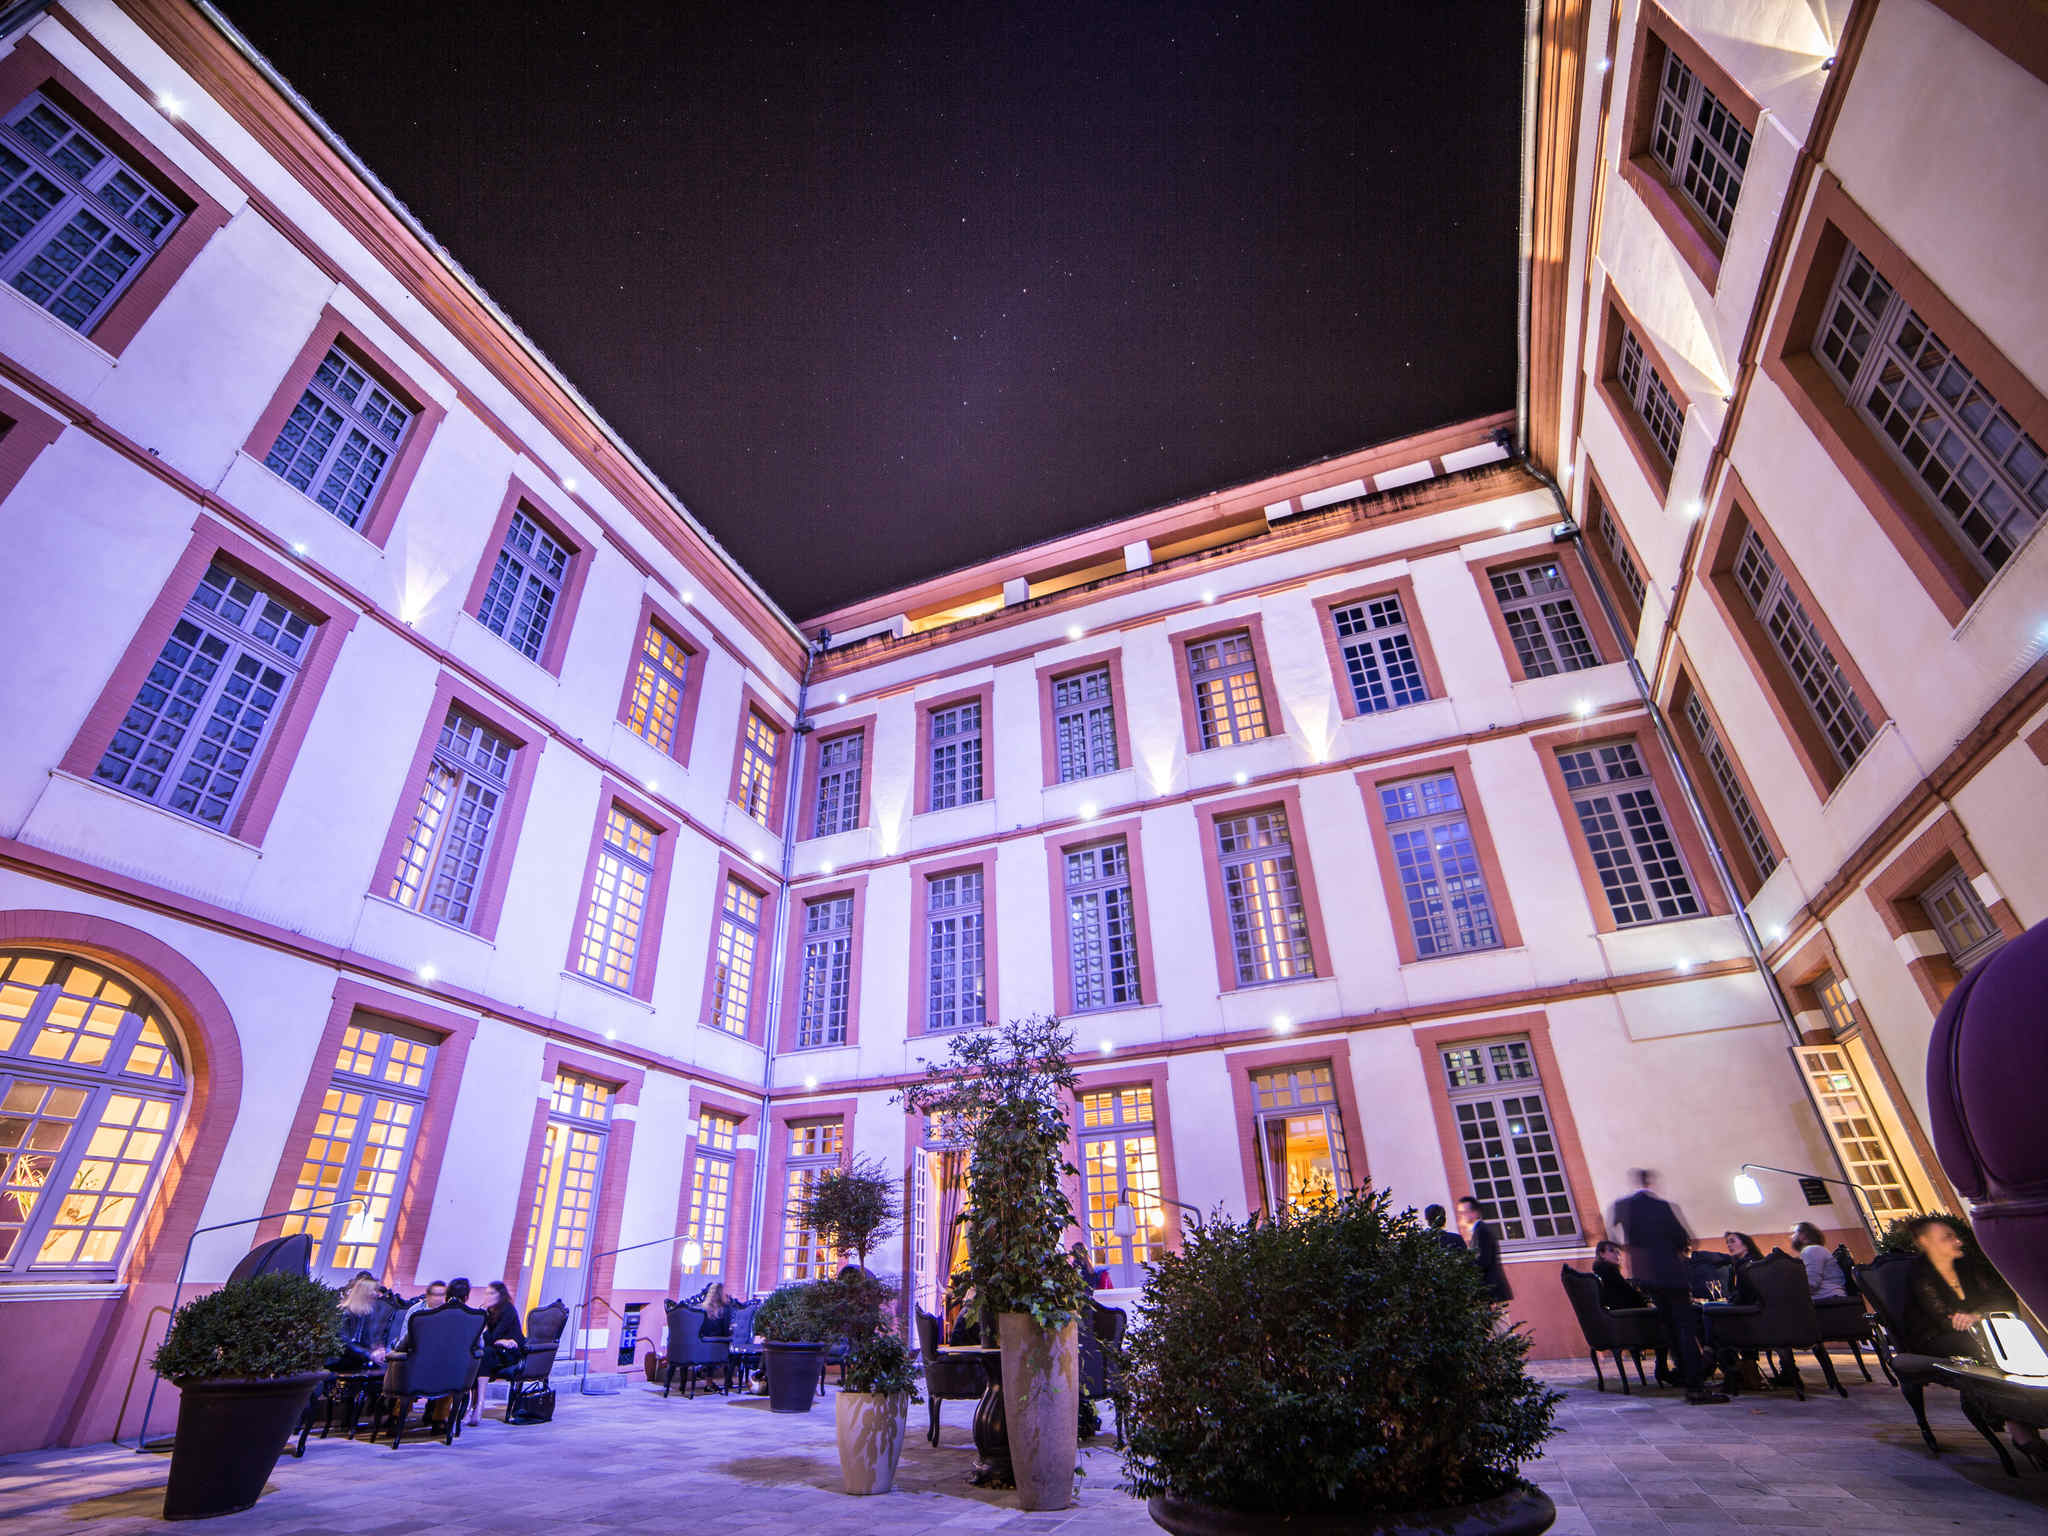 Hotel - La Cour des Consuls Hôtel & Spa Toulouse - MGallery by Sofitel